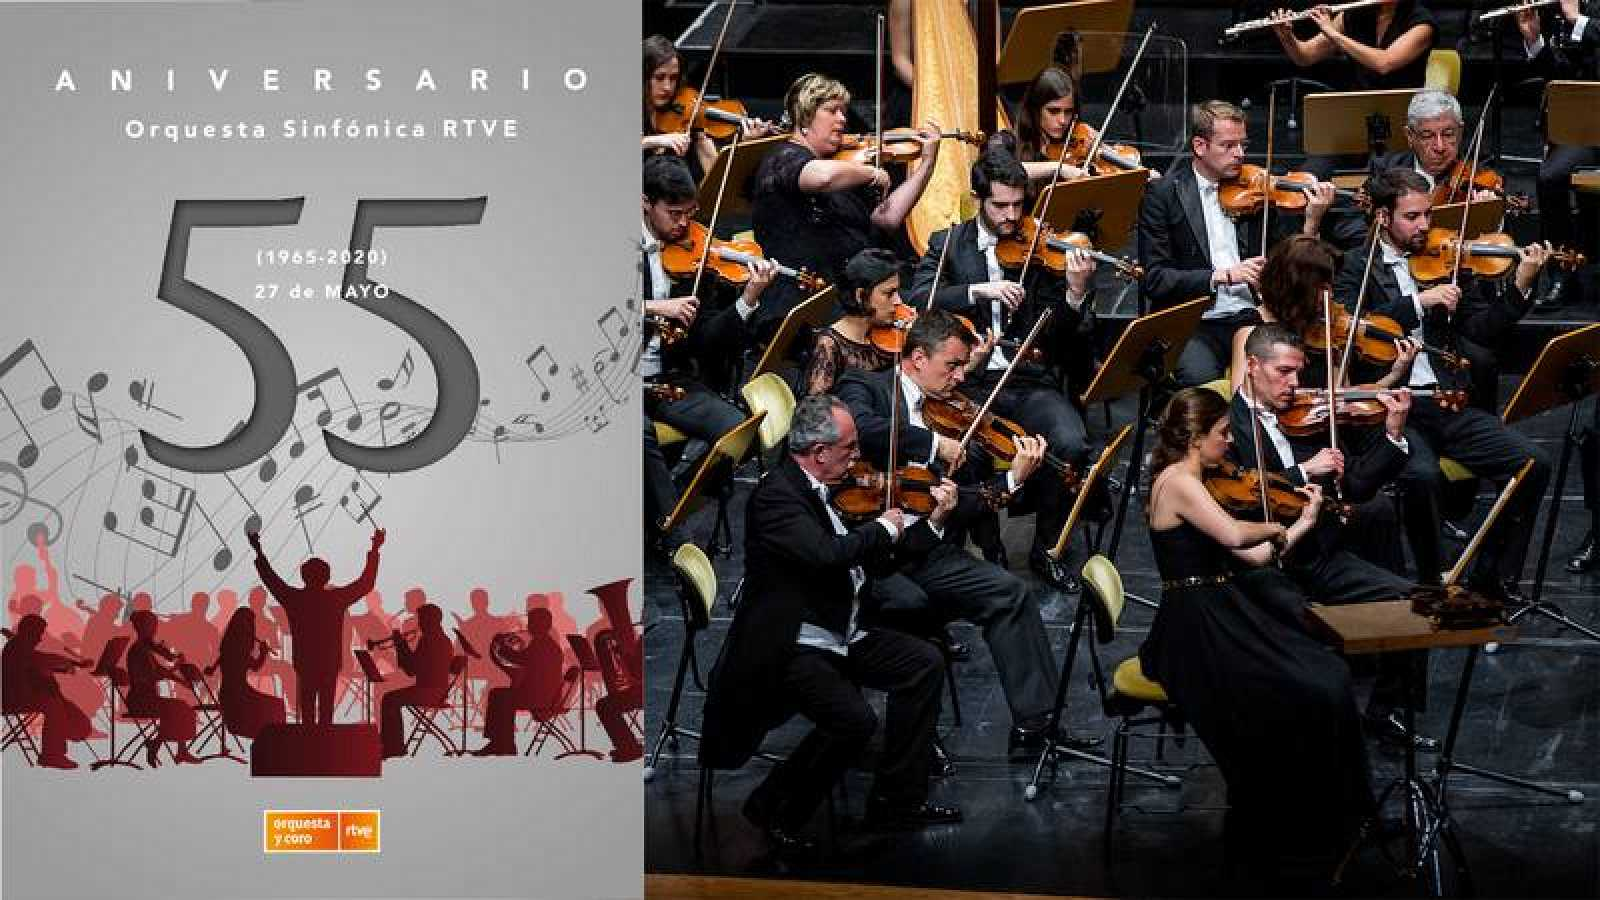 55º Aniversario Orquesta Sinfónica RTVE